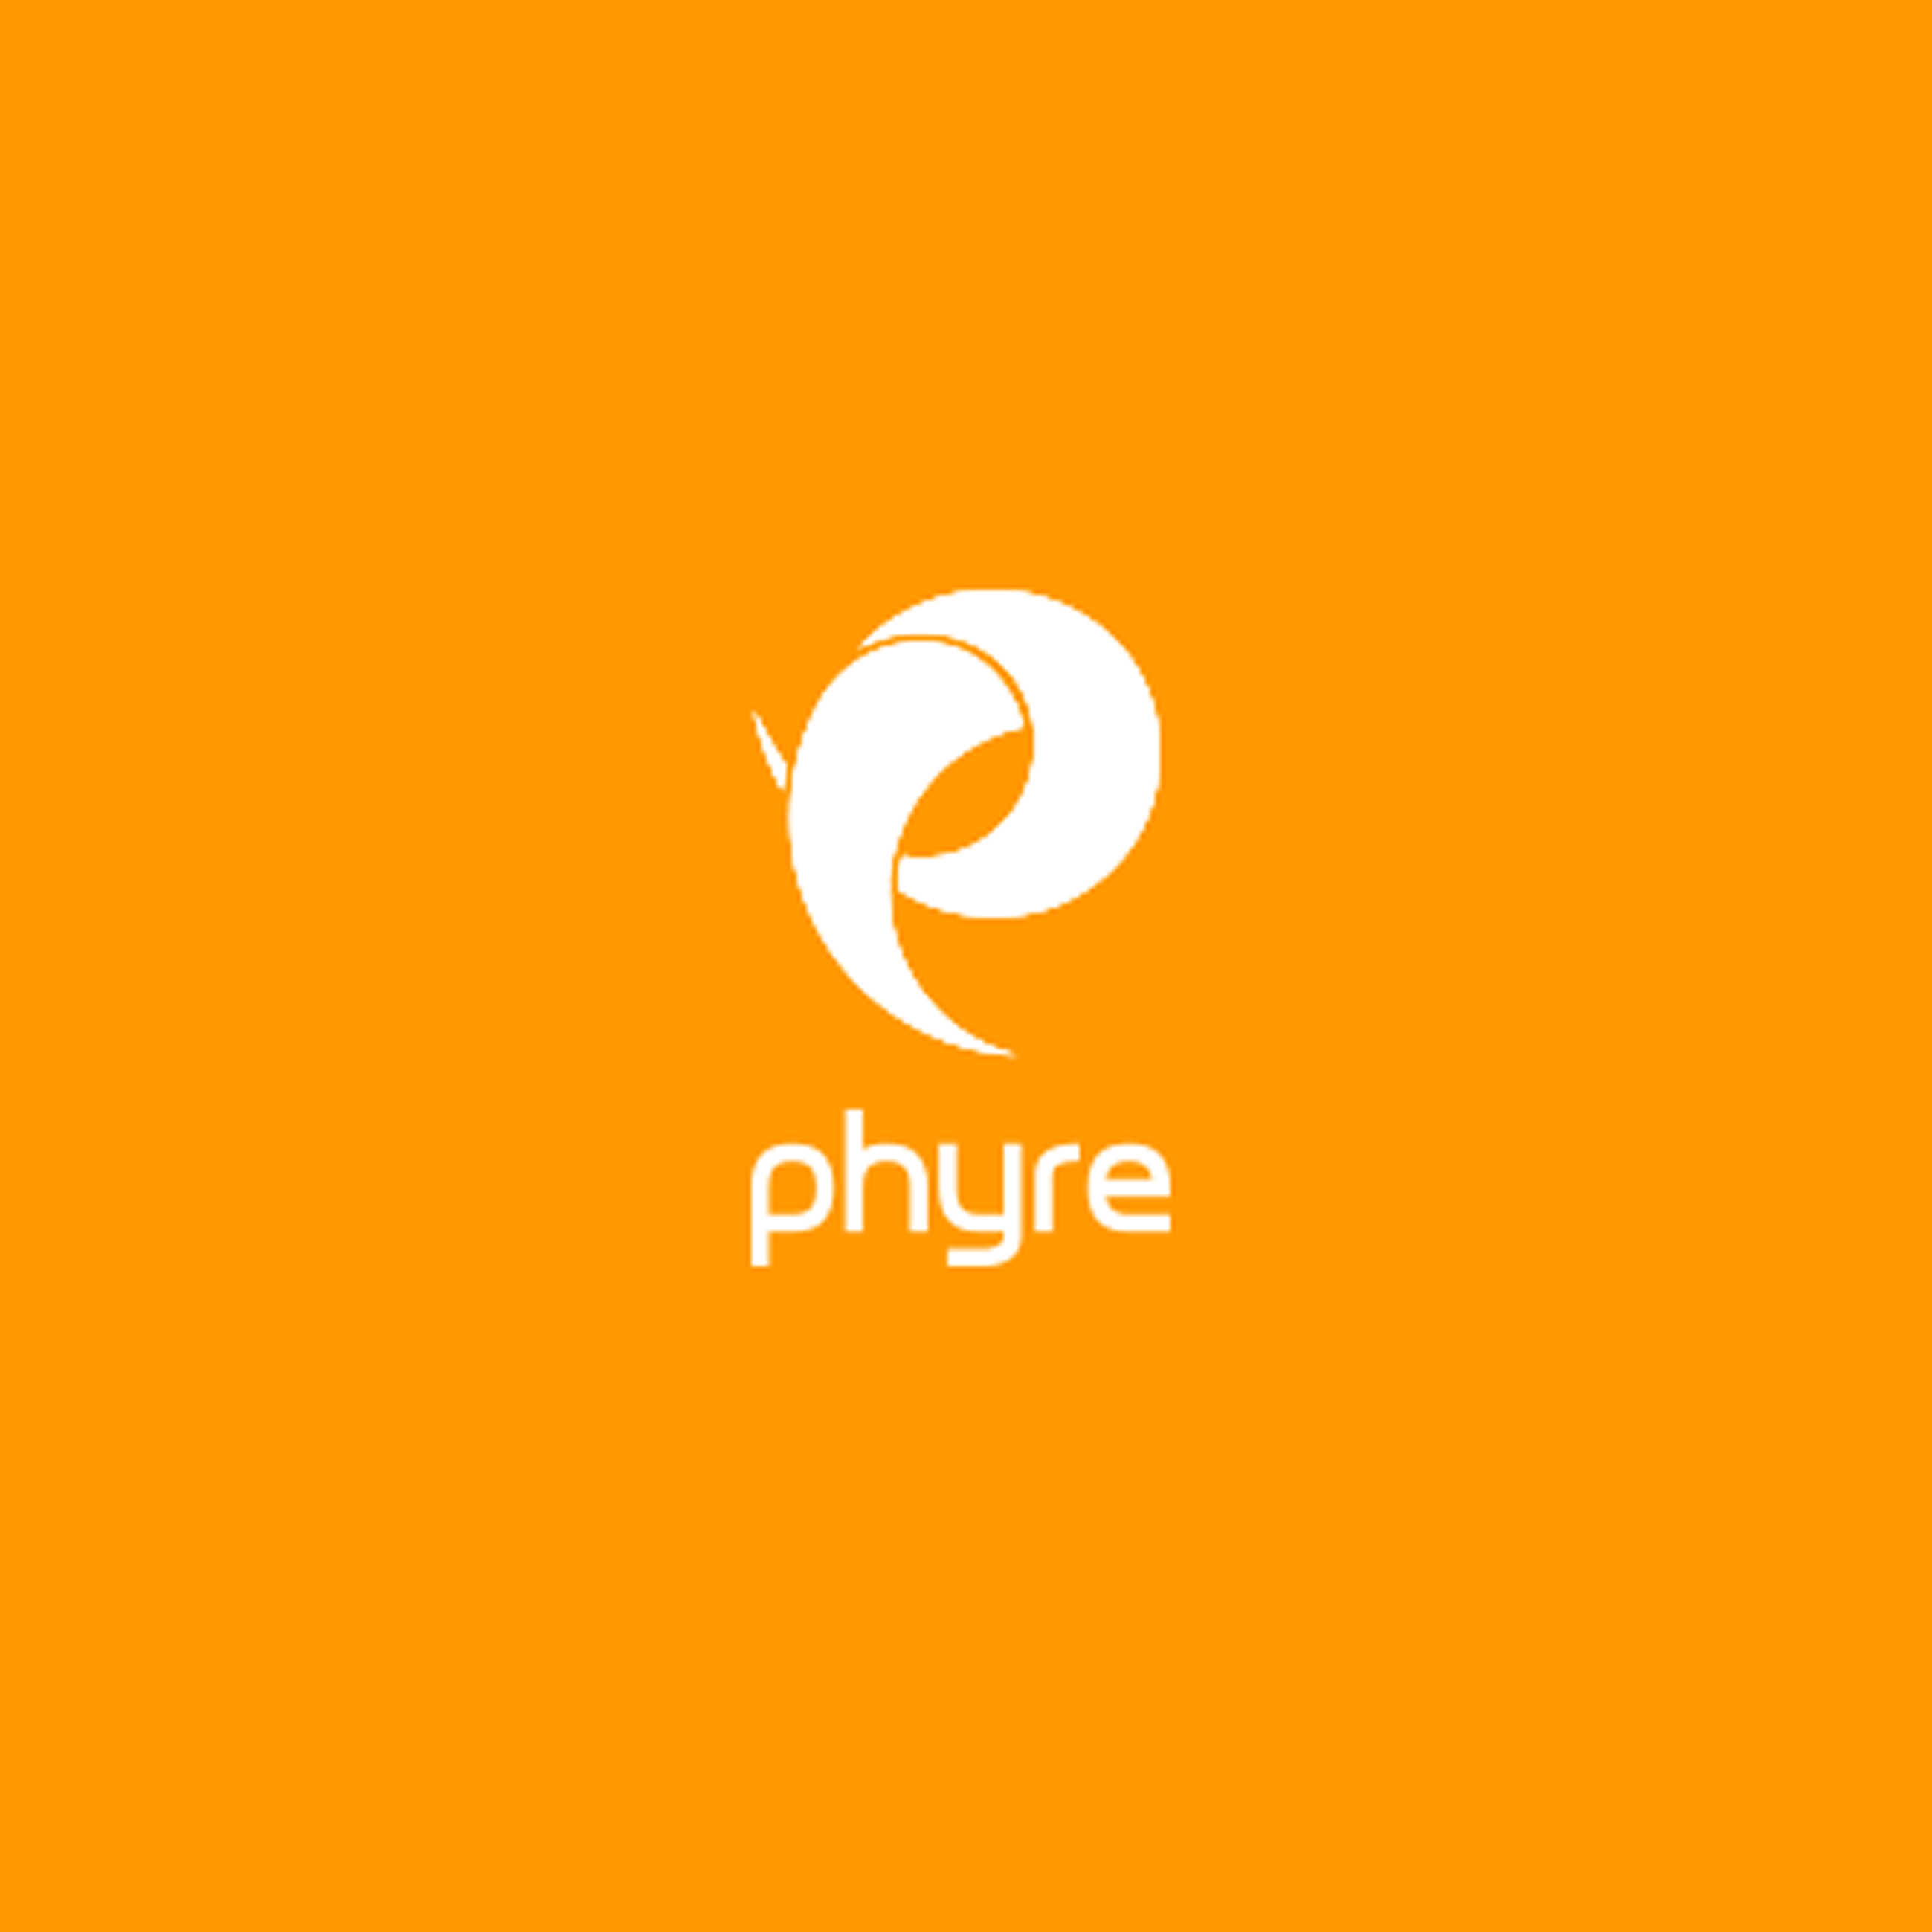 Phyre